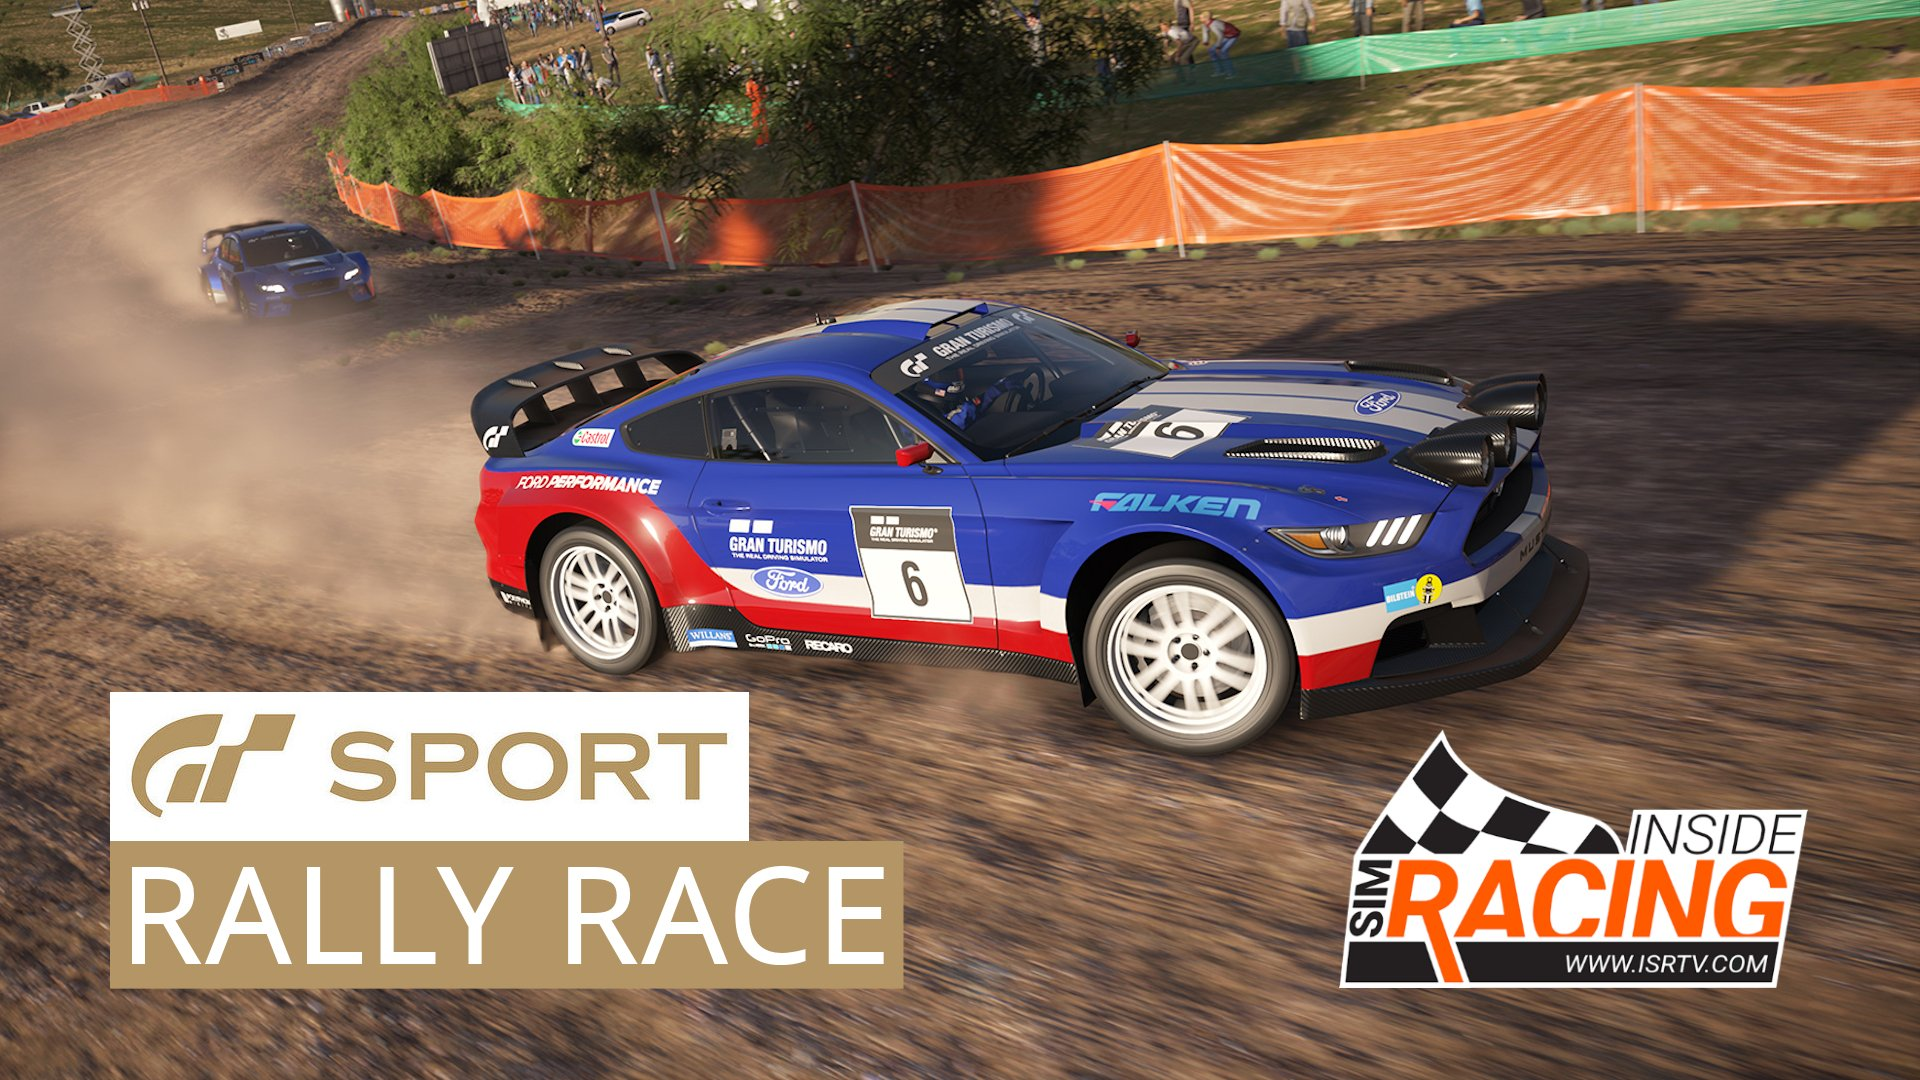 Gran Turismo Sport E3 2017 Media Race Mustang Rally At Sardegna Inside Sim Racing